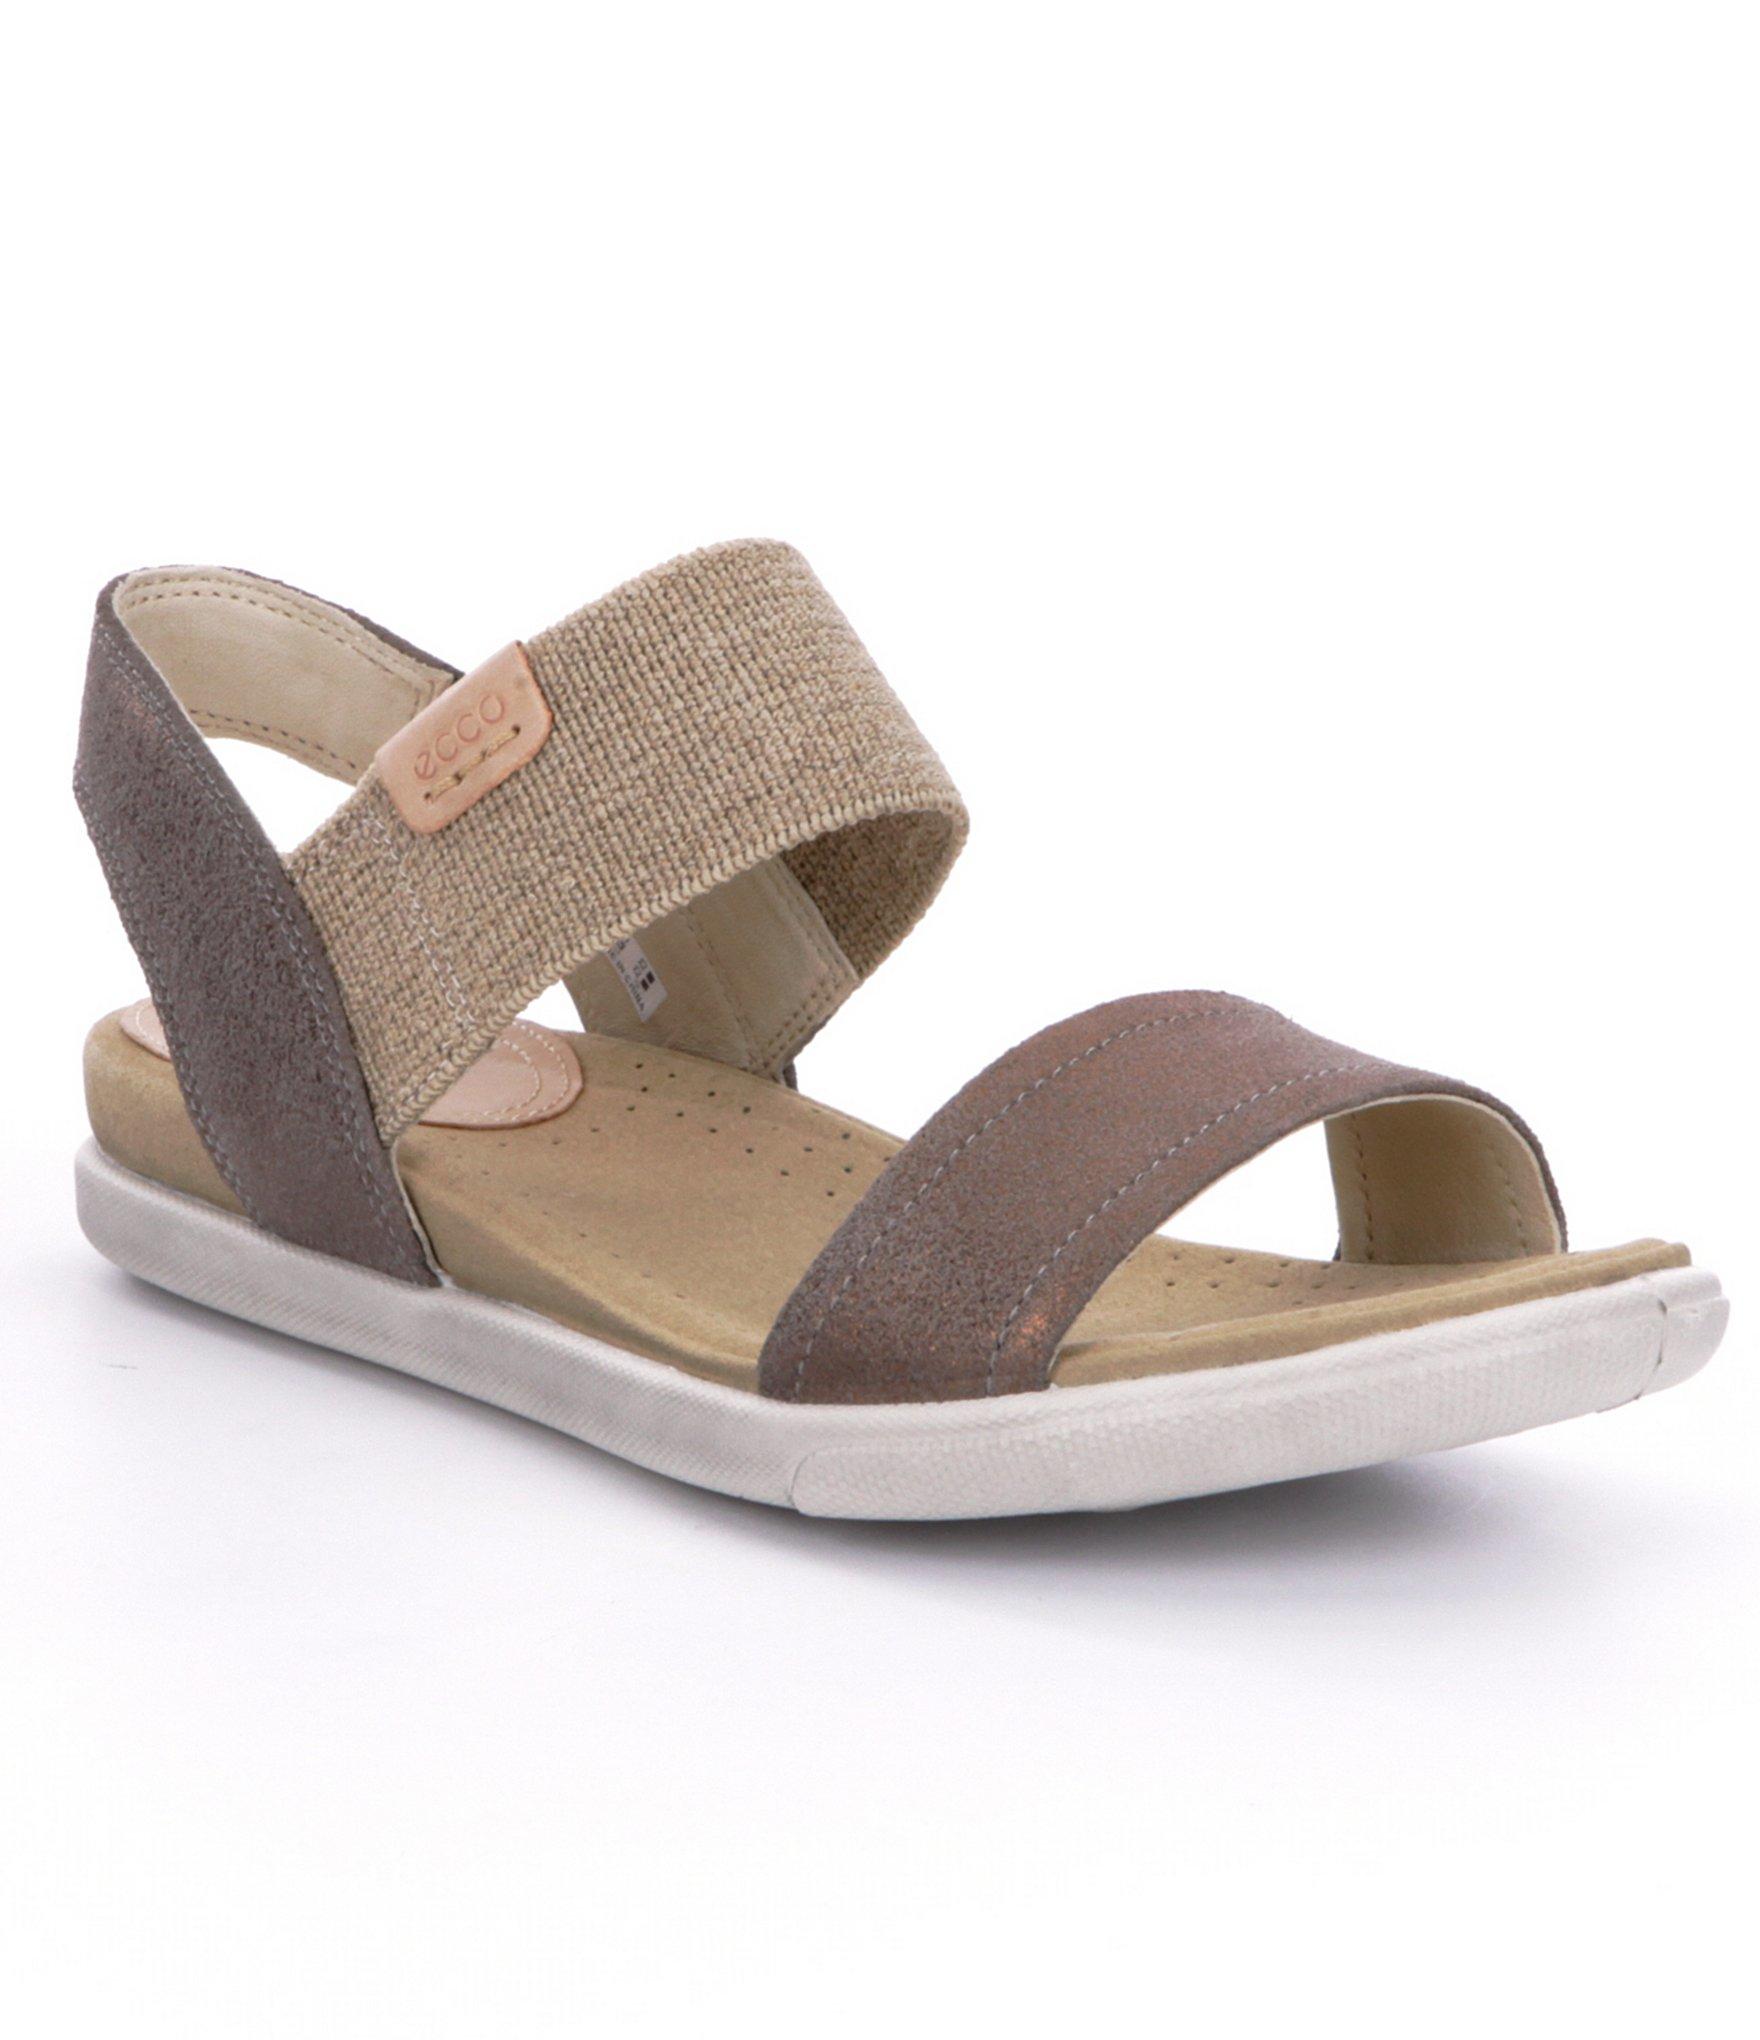 fe8ae143d3e6 Lyst - Ecco Damara Women s Sandals in Gray